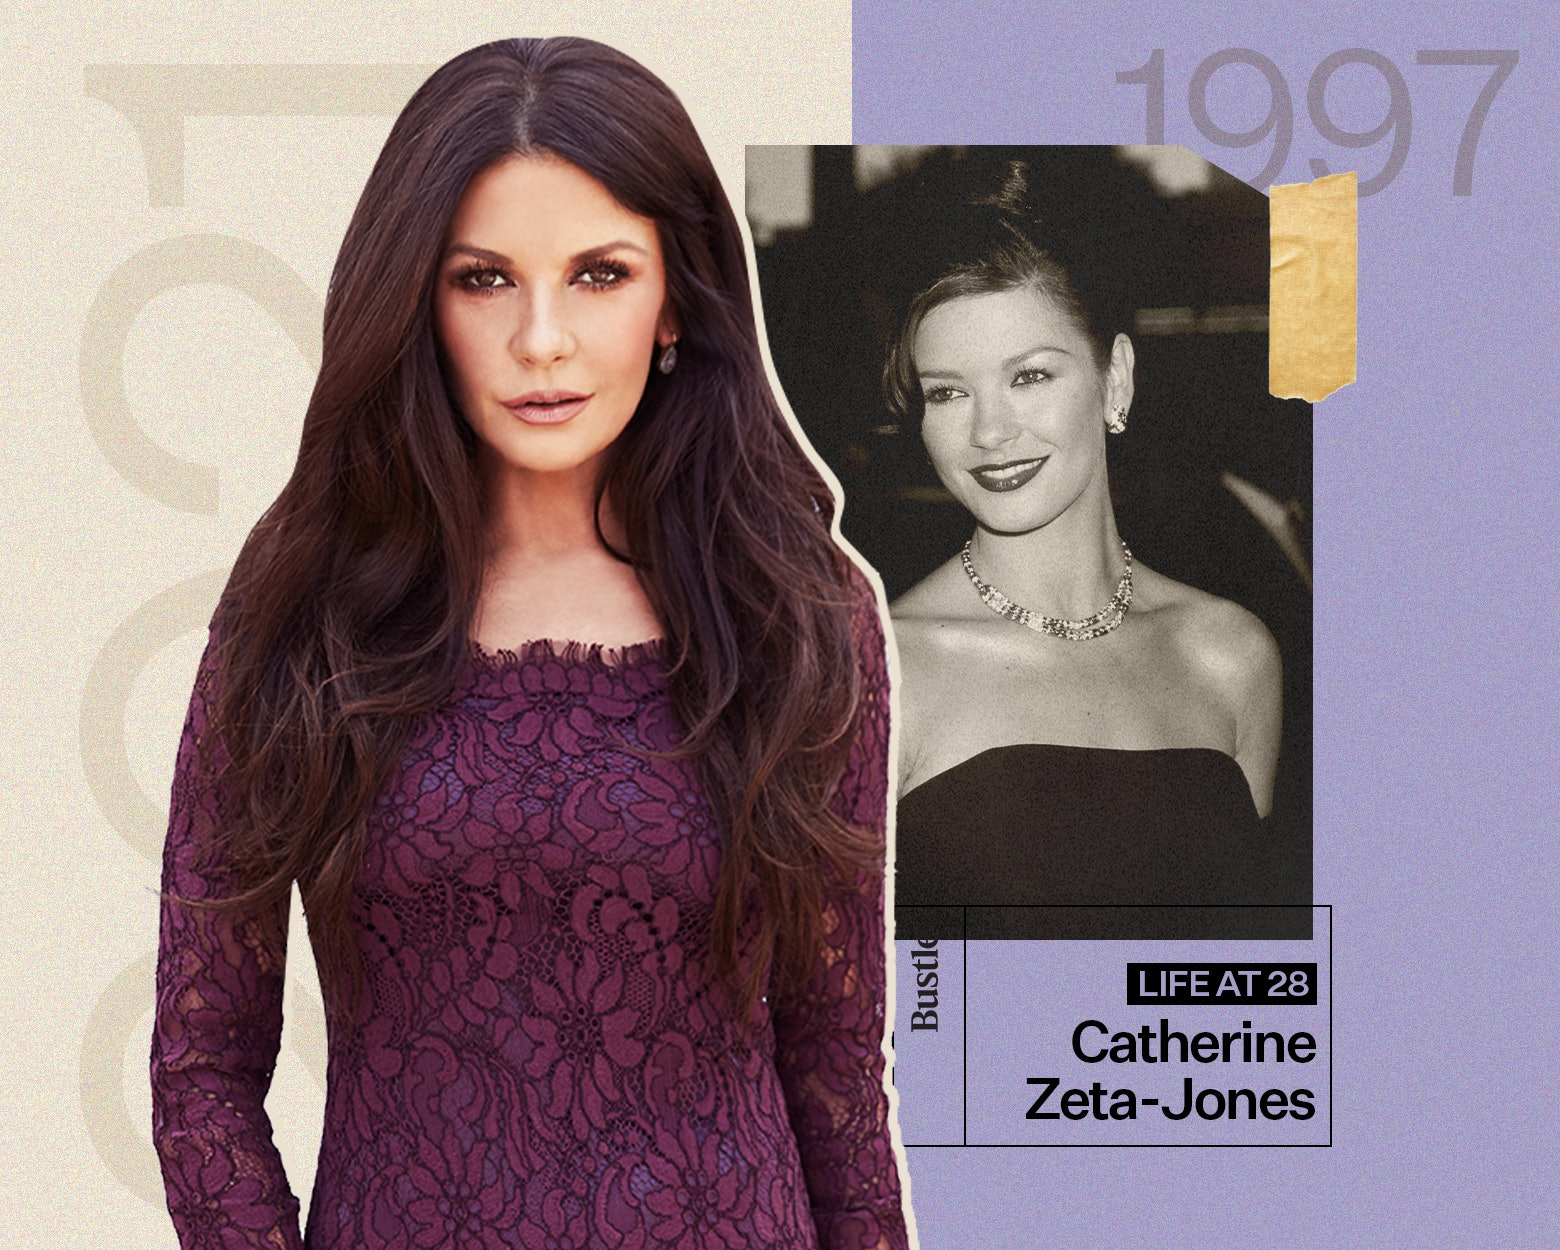 Catherine Zeta-Jones On 'Zorro' & Meeting Husband Michael Douglas At 28